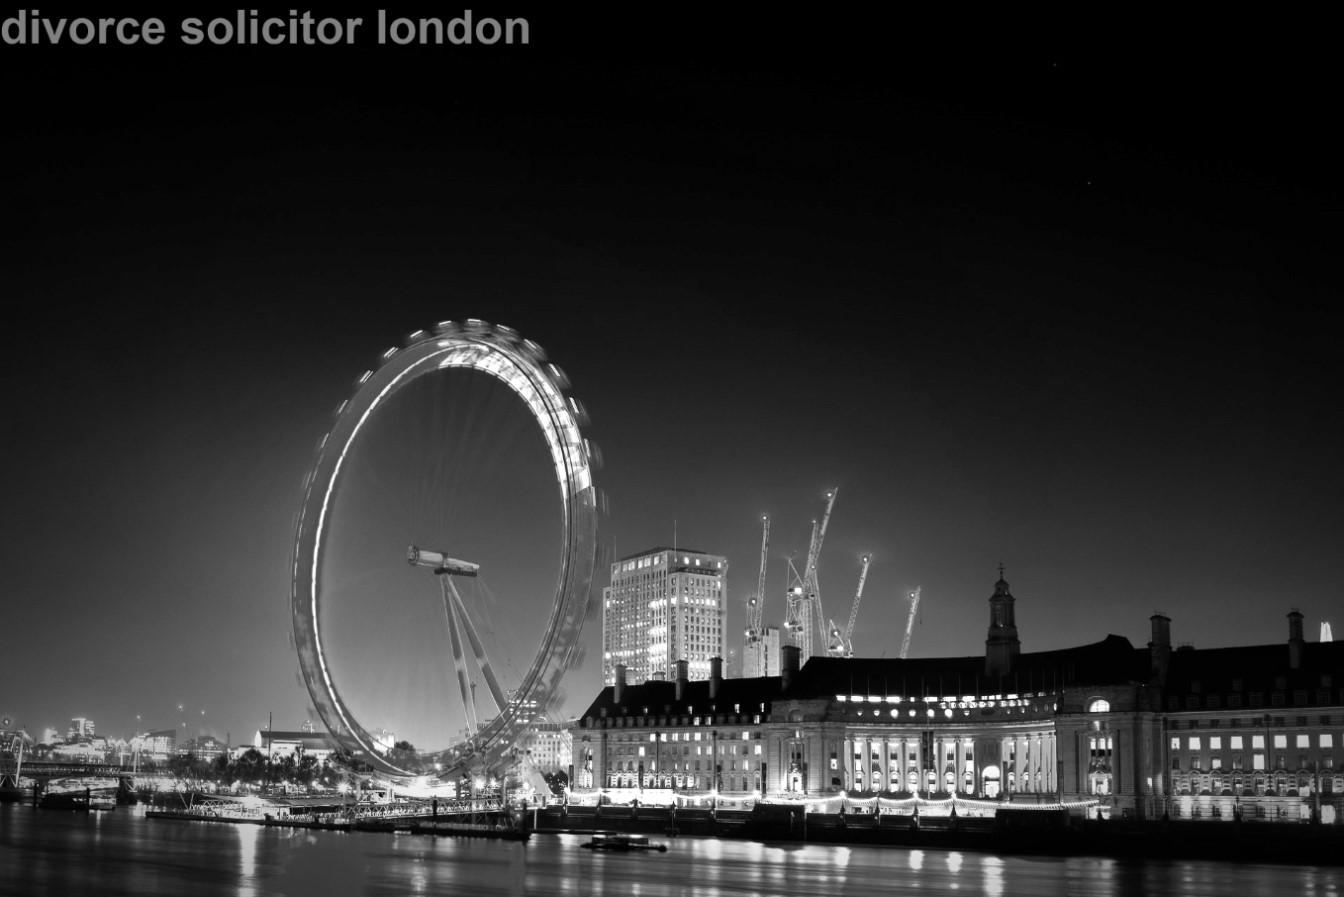 Divorce Solicitor London